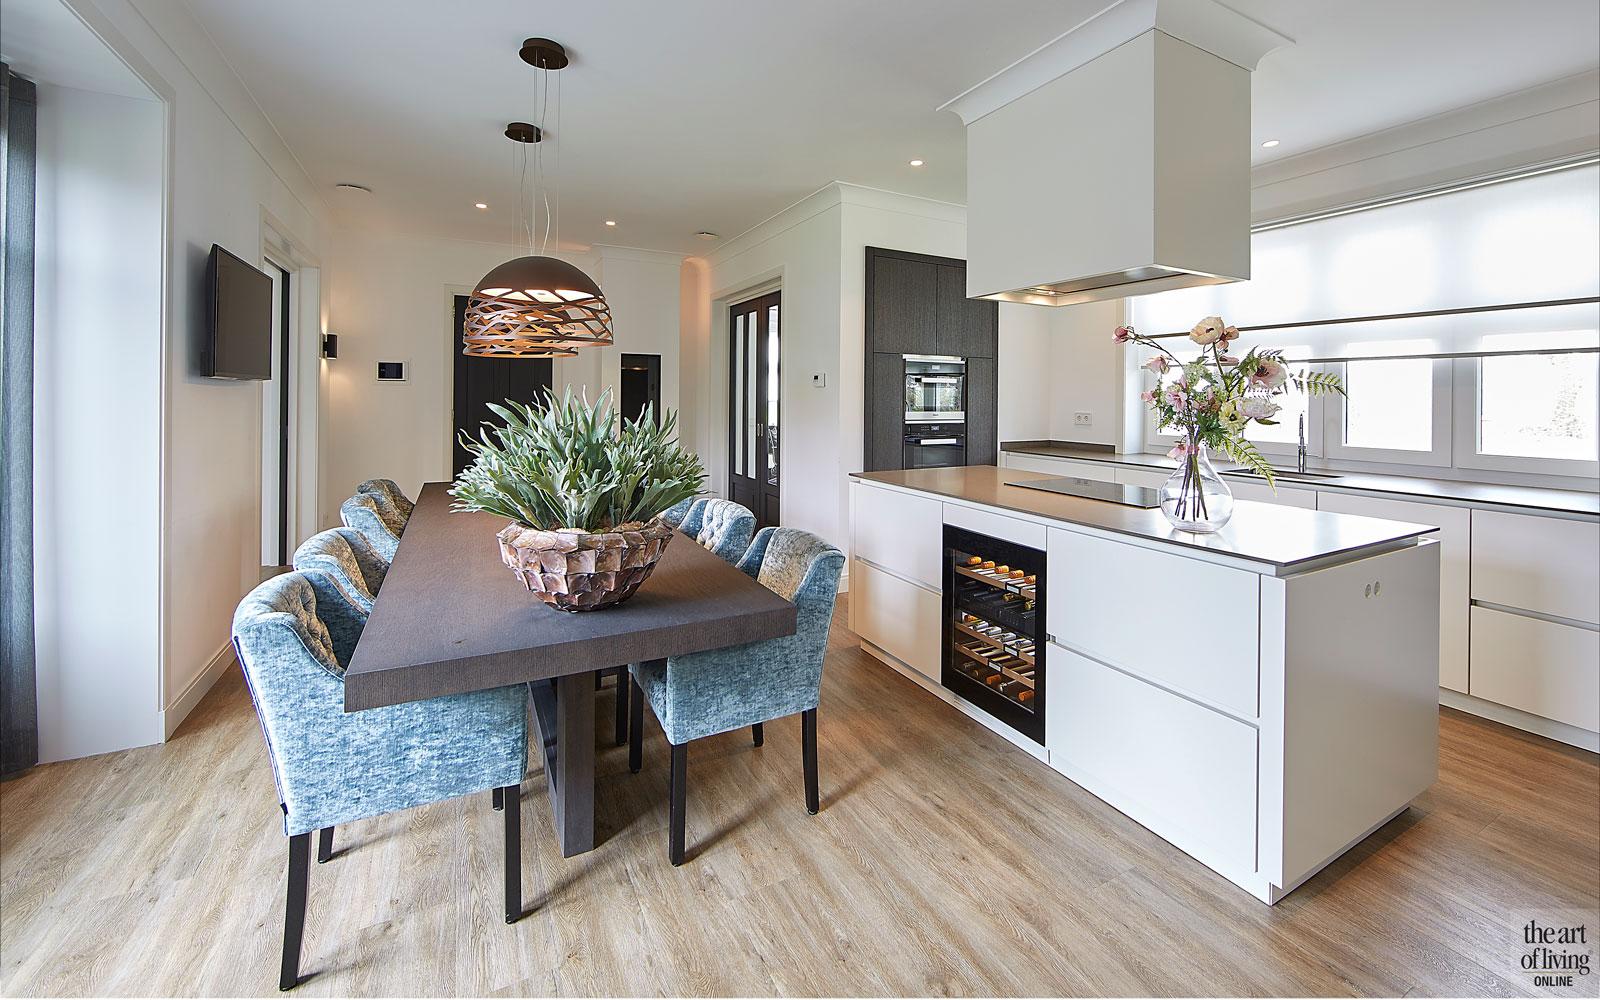 Keuken, Van den Berg Keukens, kookeiland, afzuigkap, ATAG, Miele, jaren 30 villa, Marco Daverveld